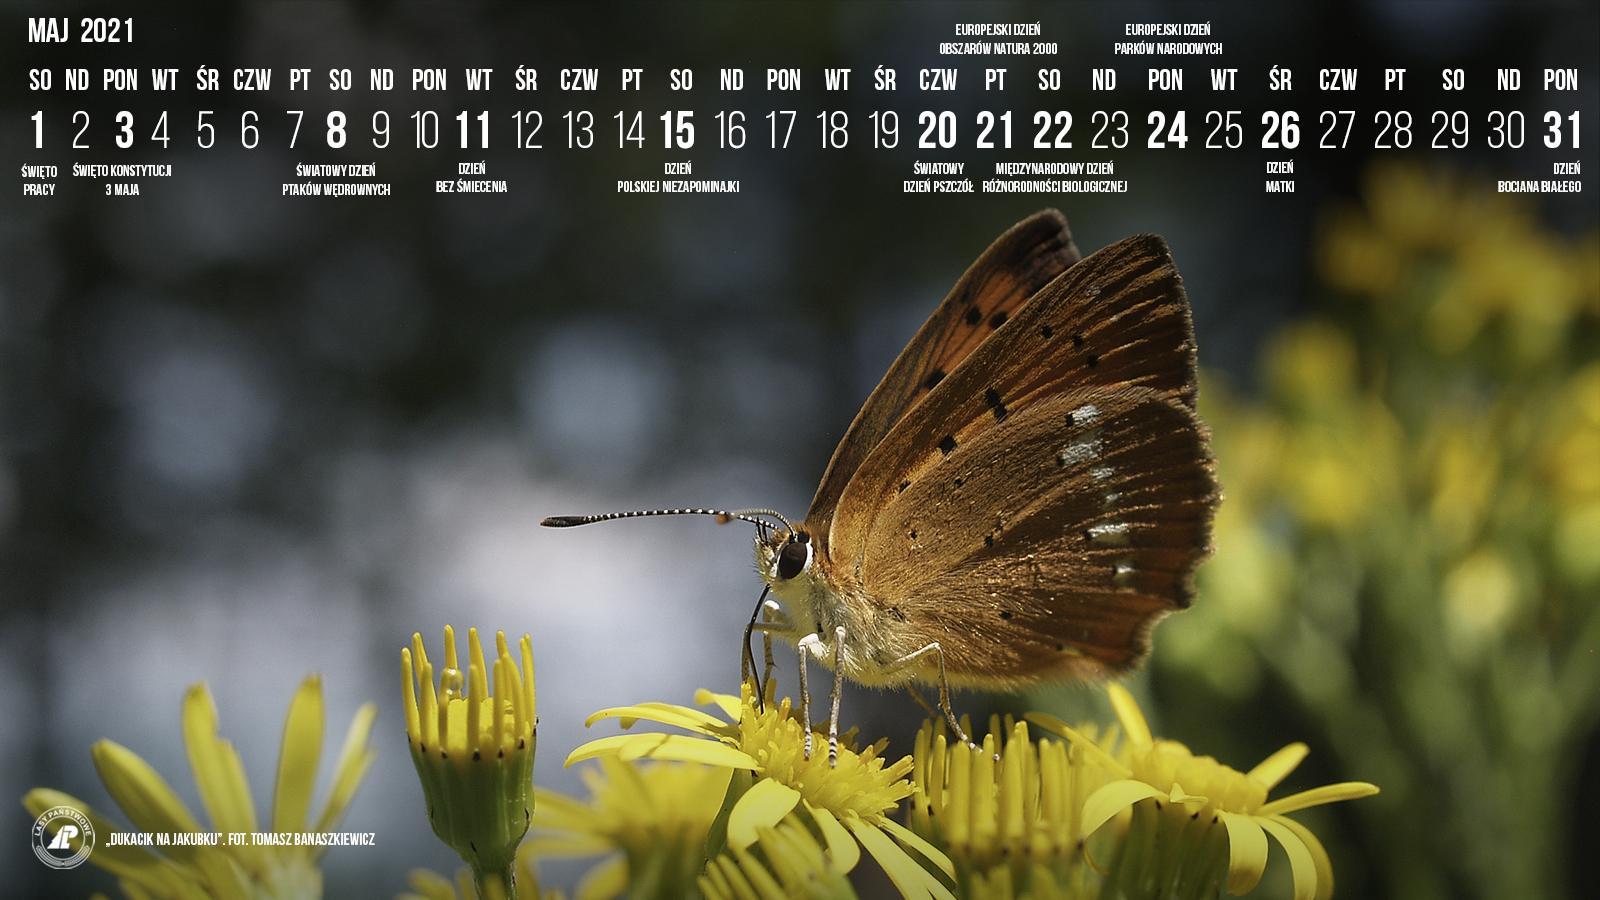 05-2021_1600x900[1].jpg